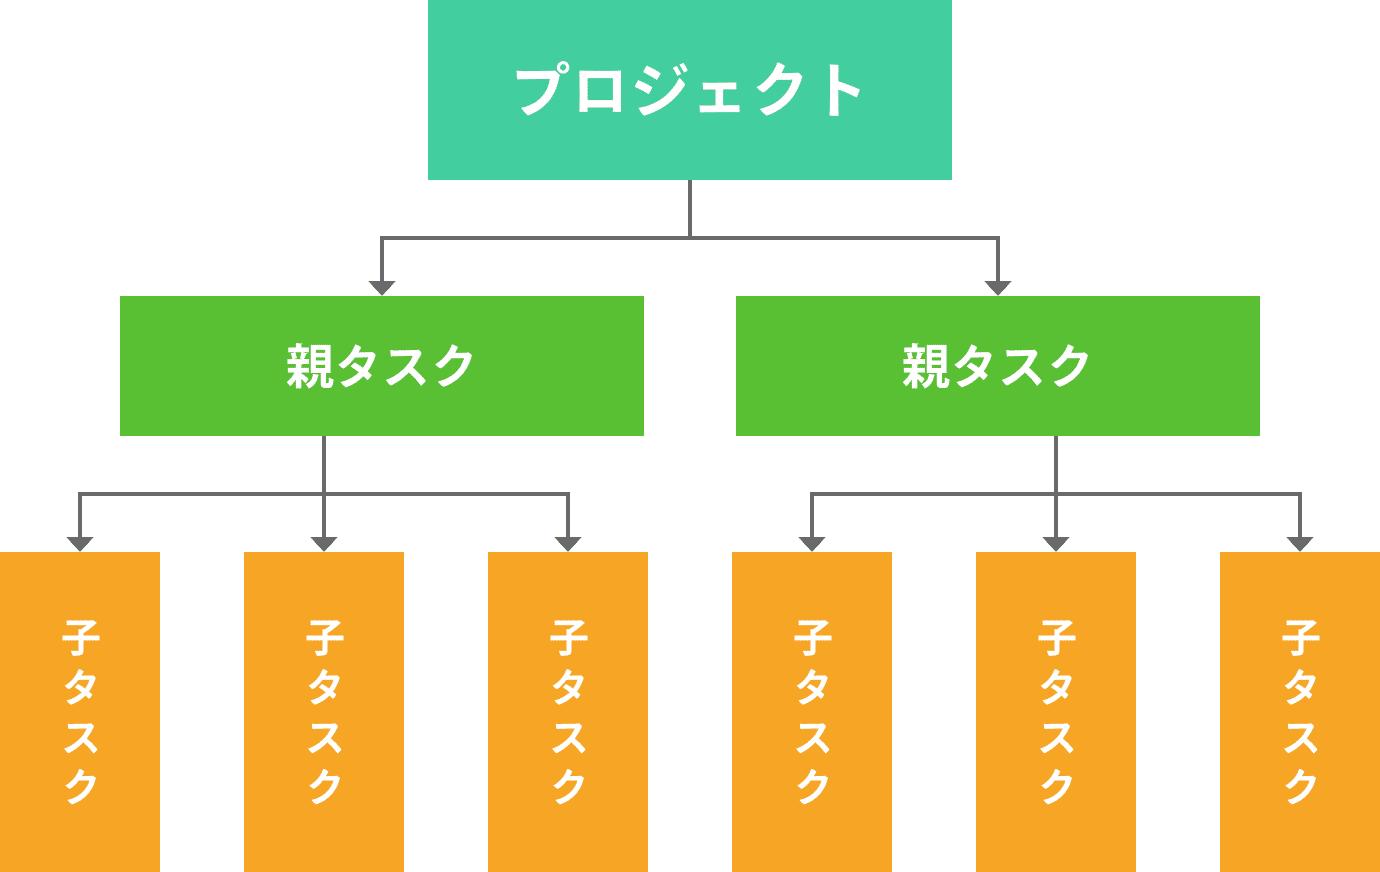 WBSとは?作り方の基本とガントチャートとの違いを解説